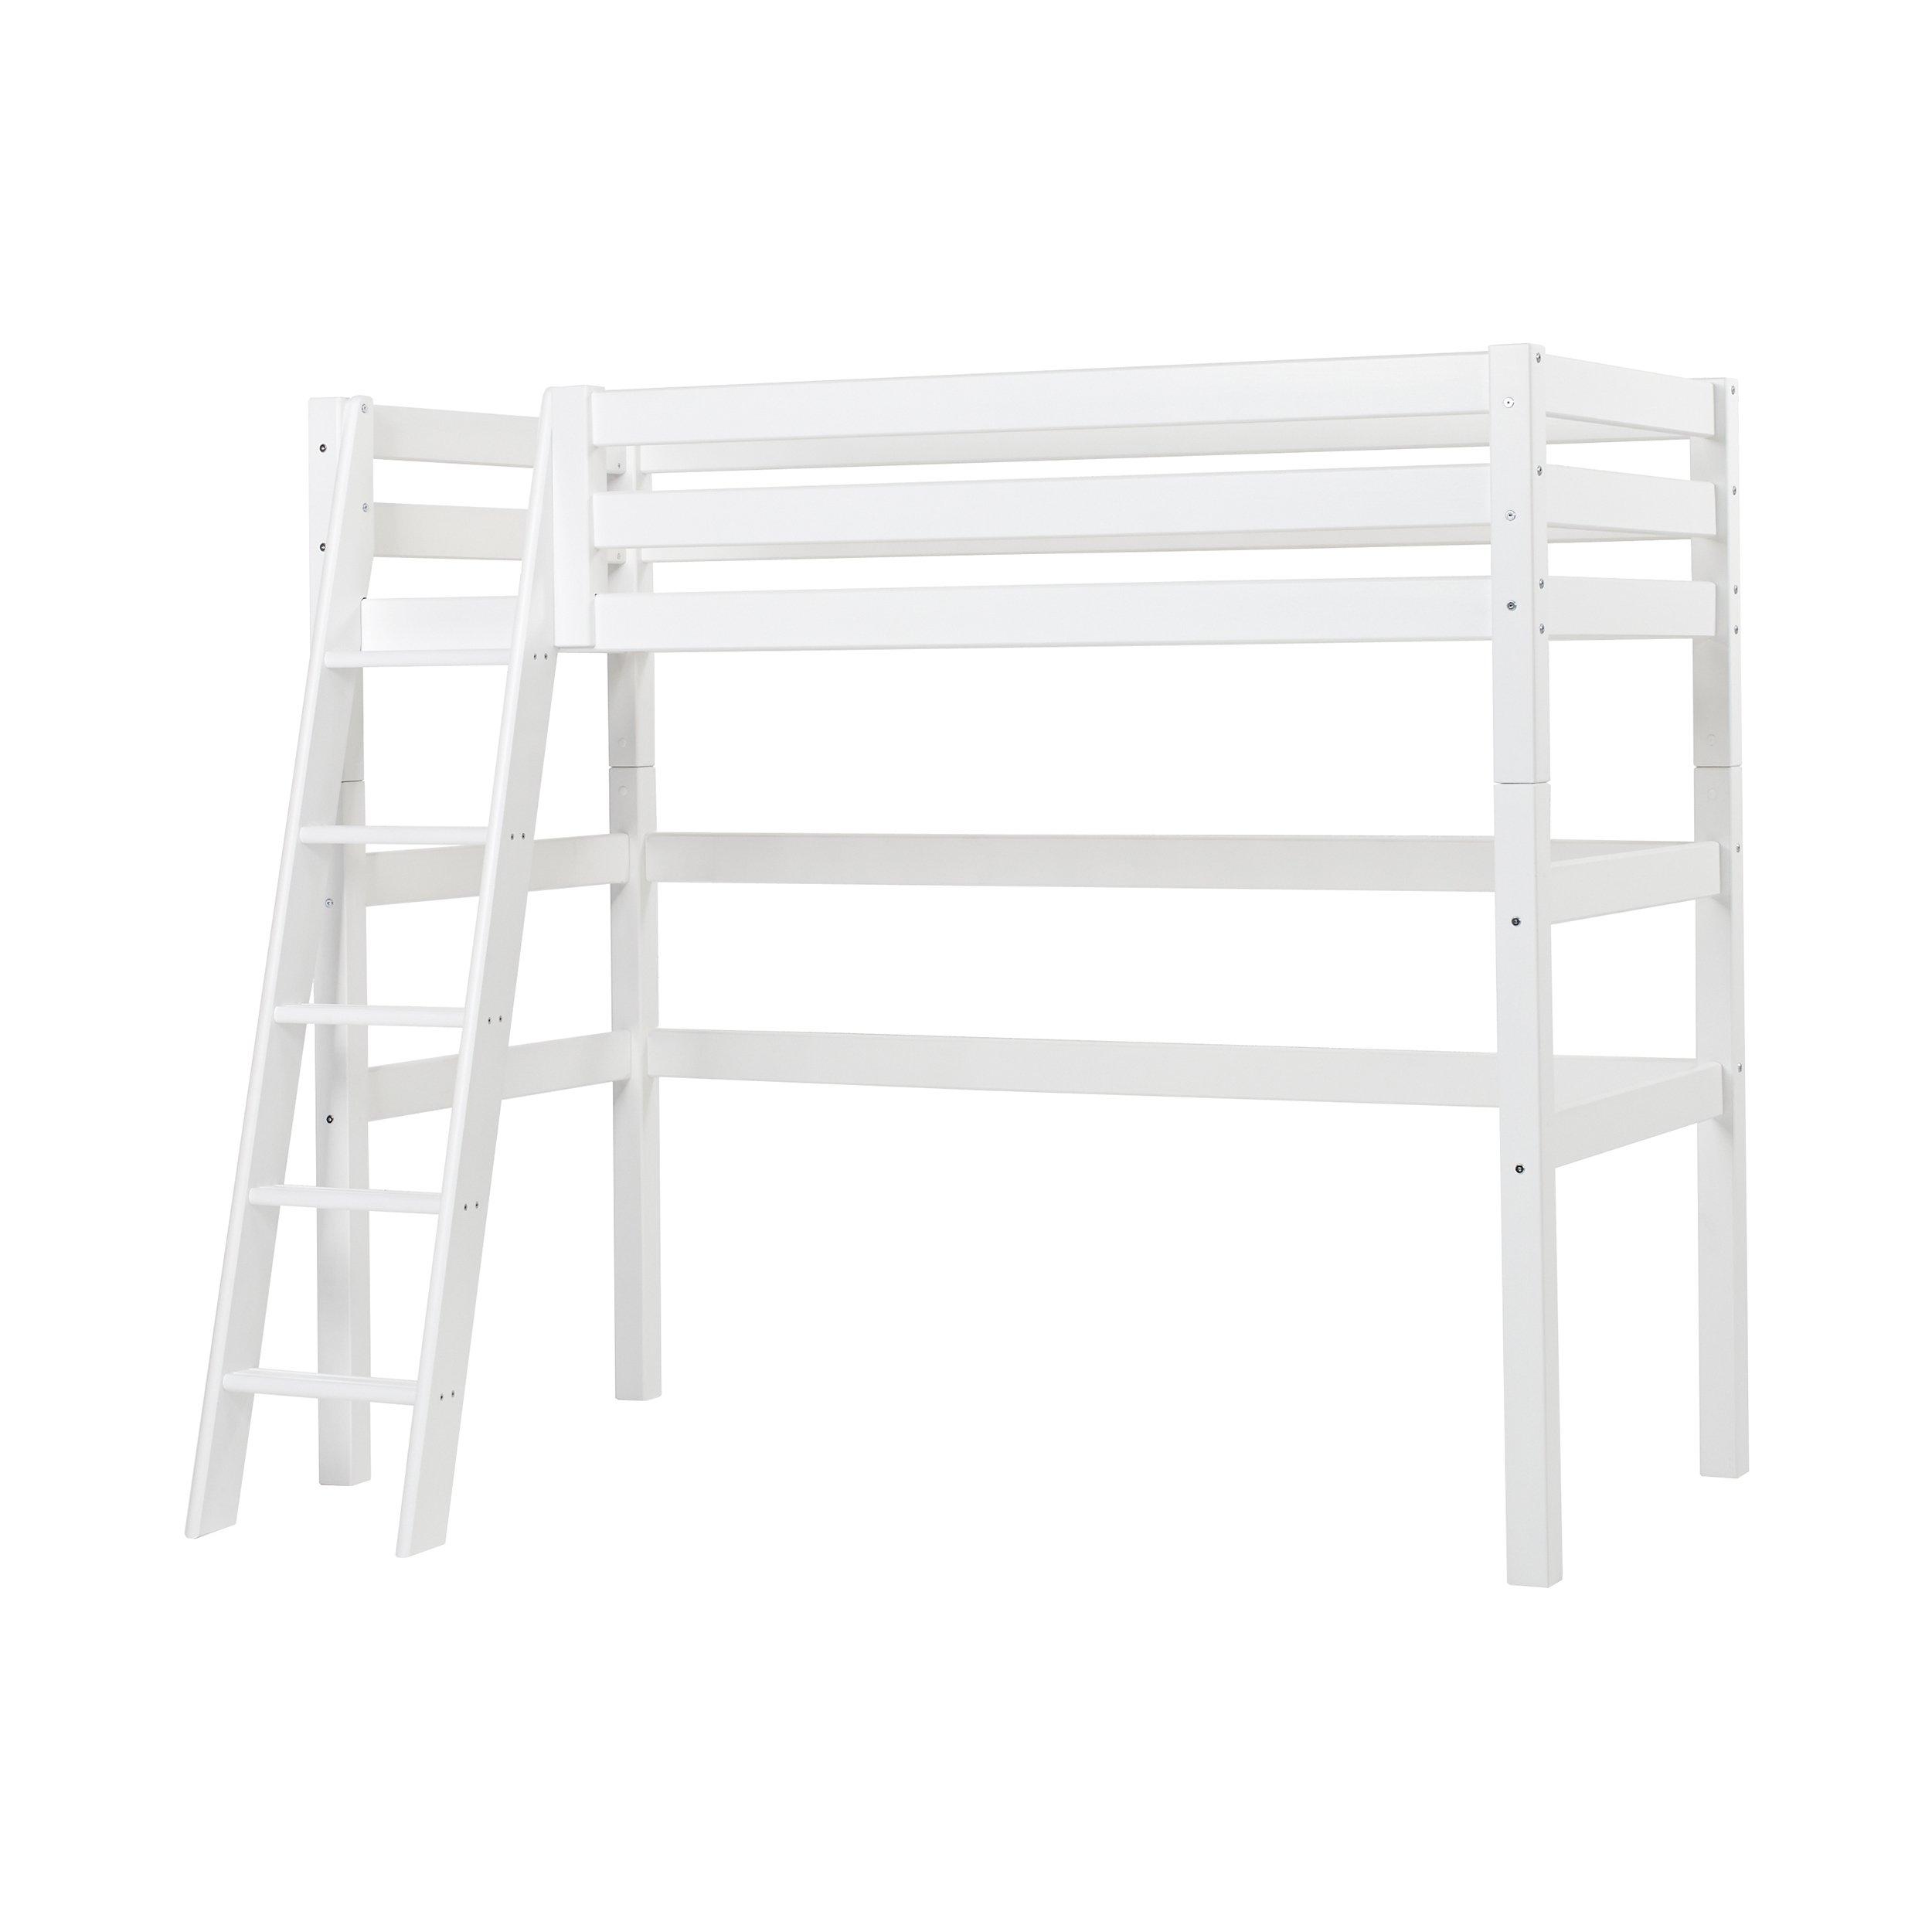 Hoppekids - PREMIUM High sleeper 90x200cm w. Slant Ladder - White